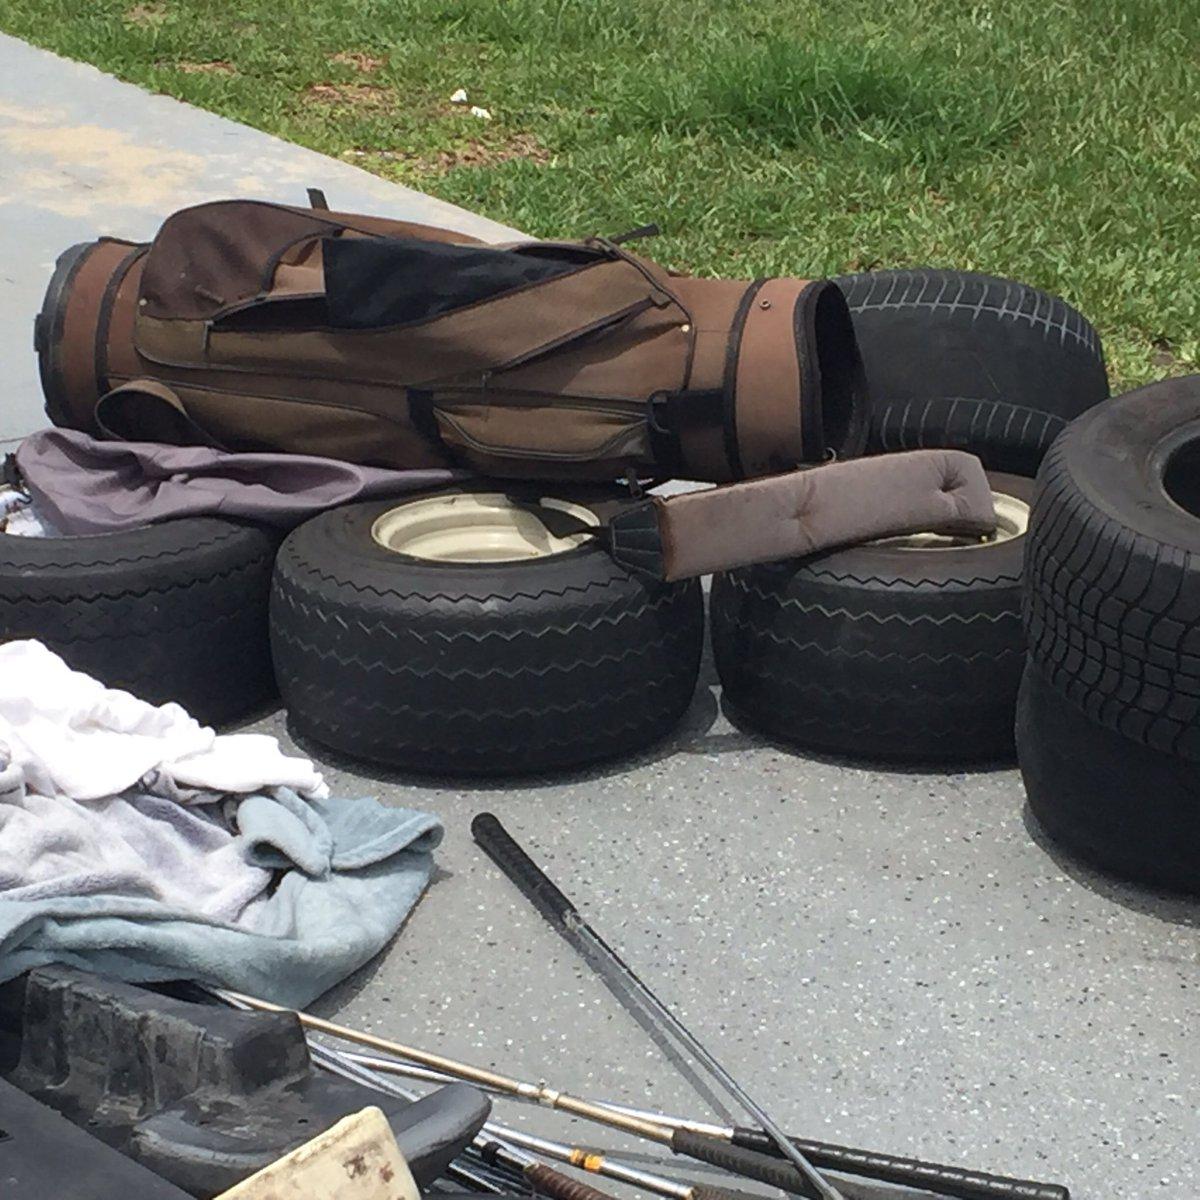 Police find golf cart chop shop during drug bust in retirement community